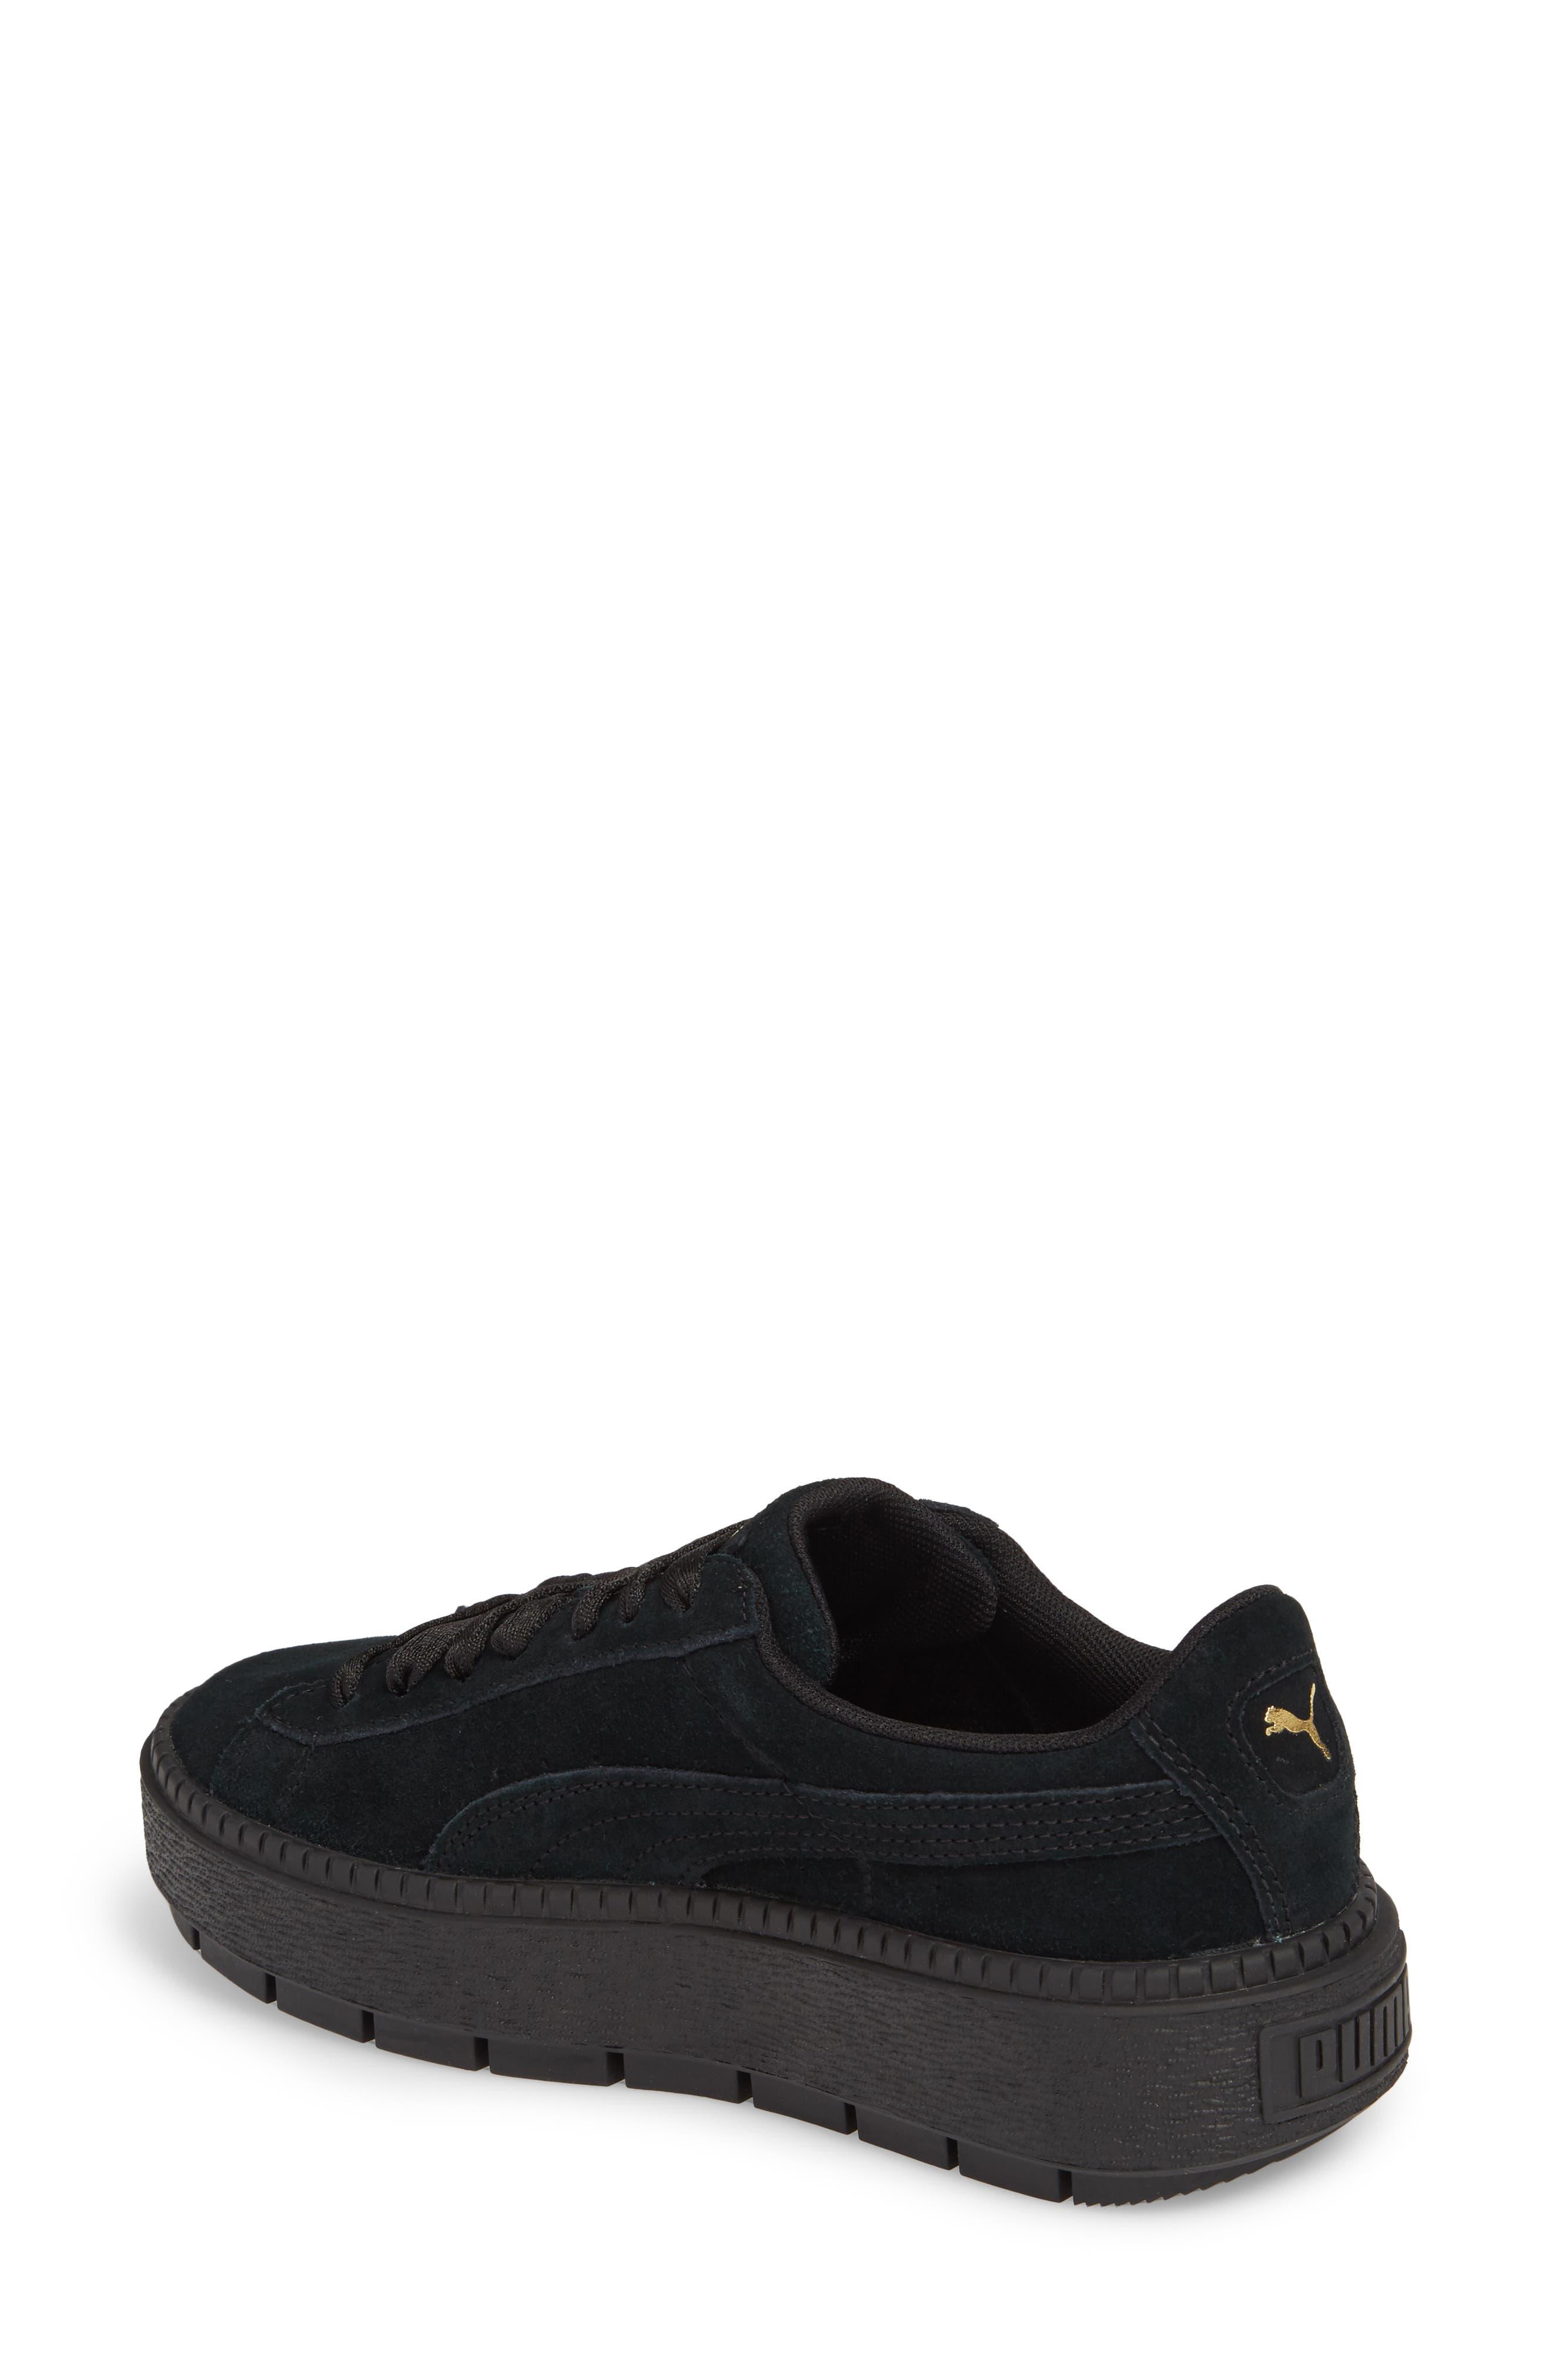 Trace Platform Sneaker,                             Alternate thumbnail 2, color,                             001